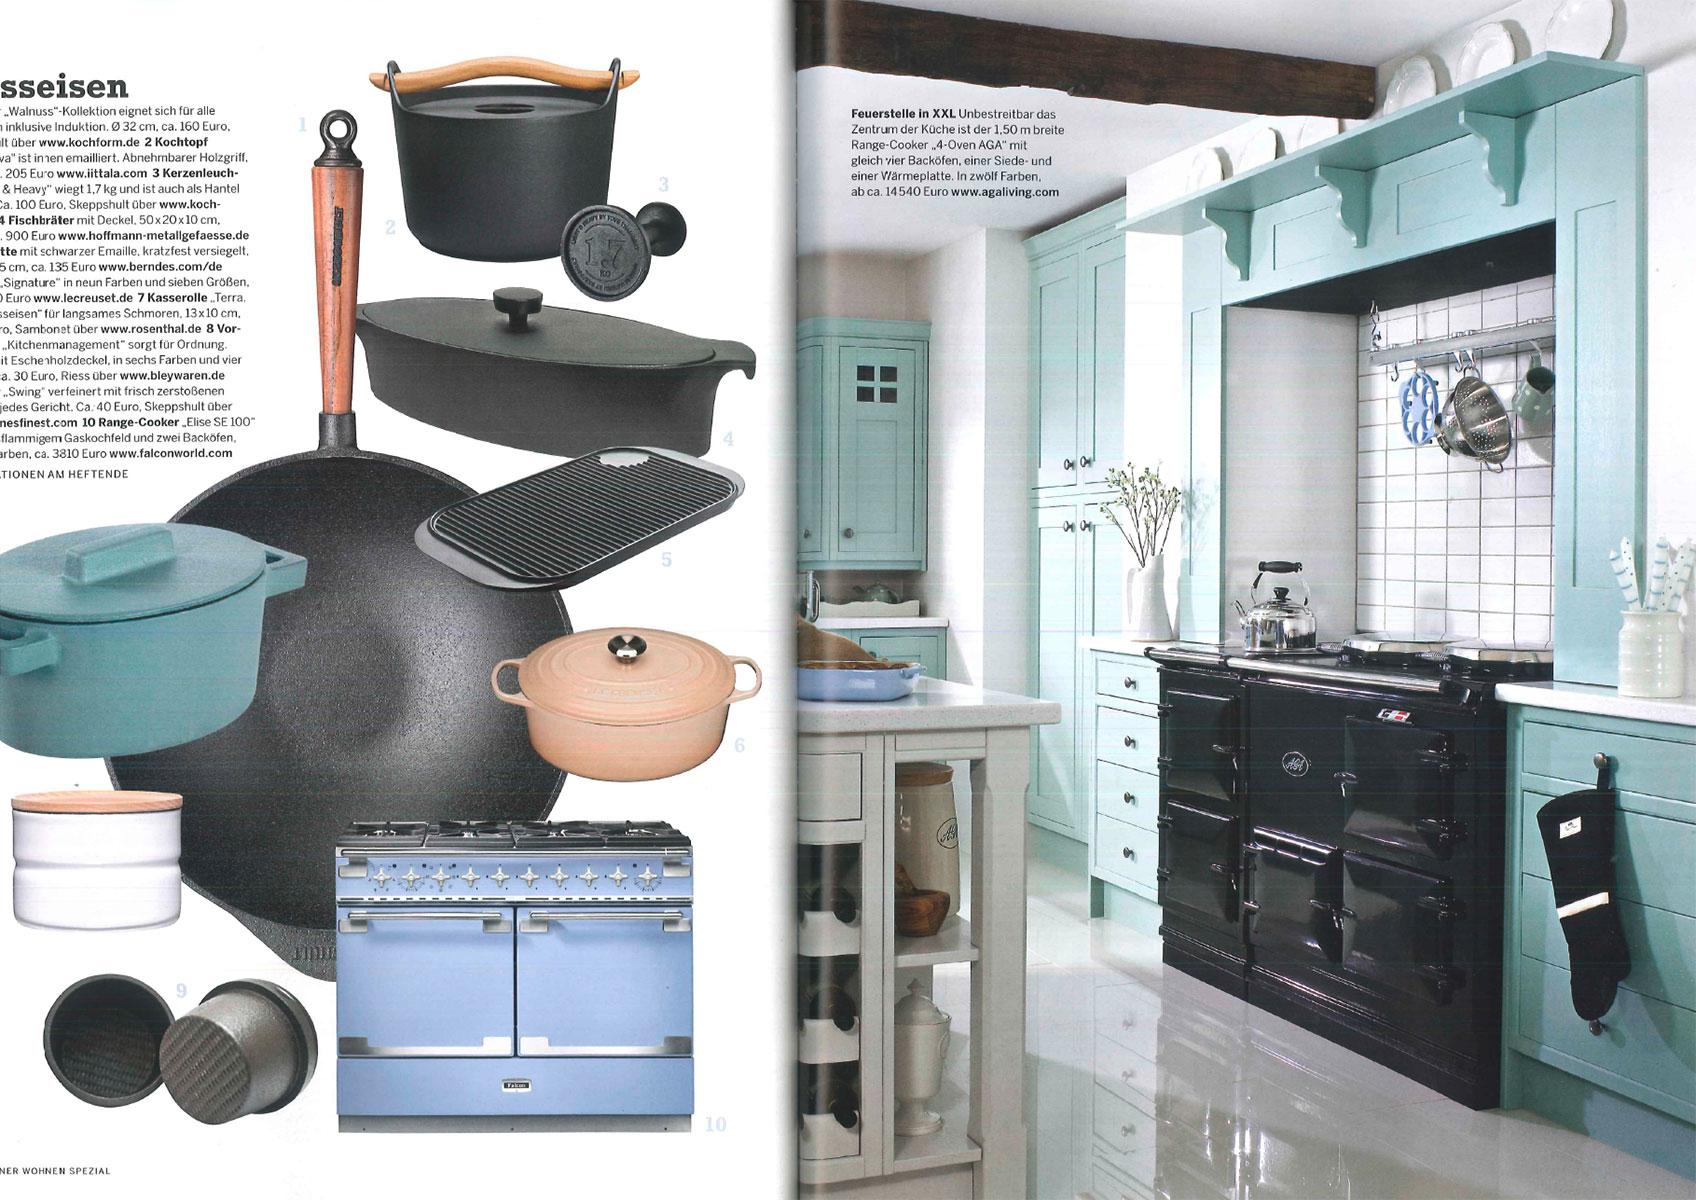 neptune aga falcon sch ner wohnen spezial 02 2015 petra sch nfeld. Black Bedroom Furniture Sets. Home Design Ideas